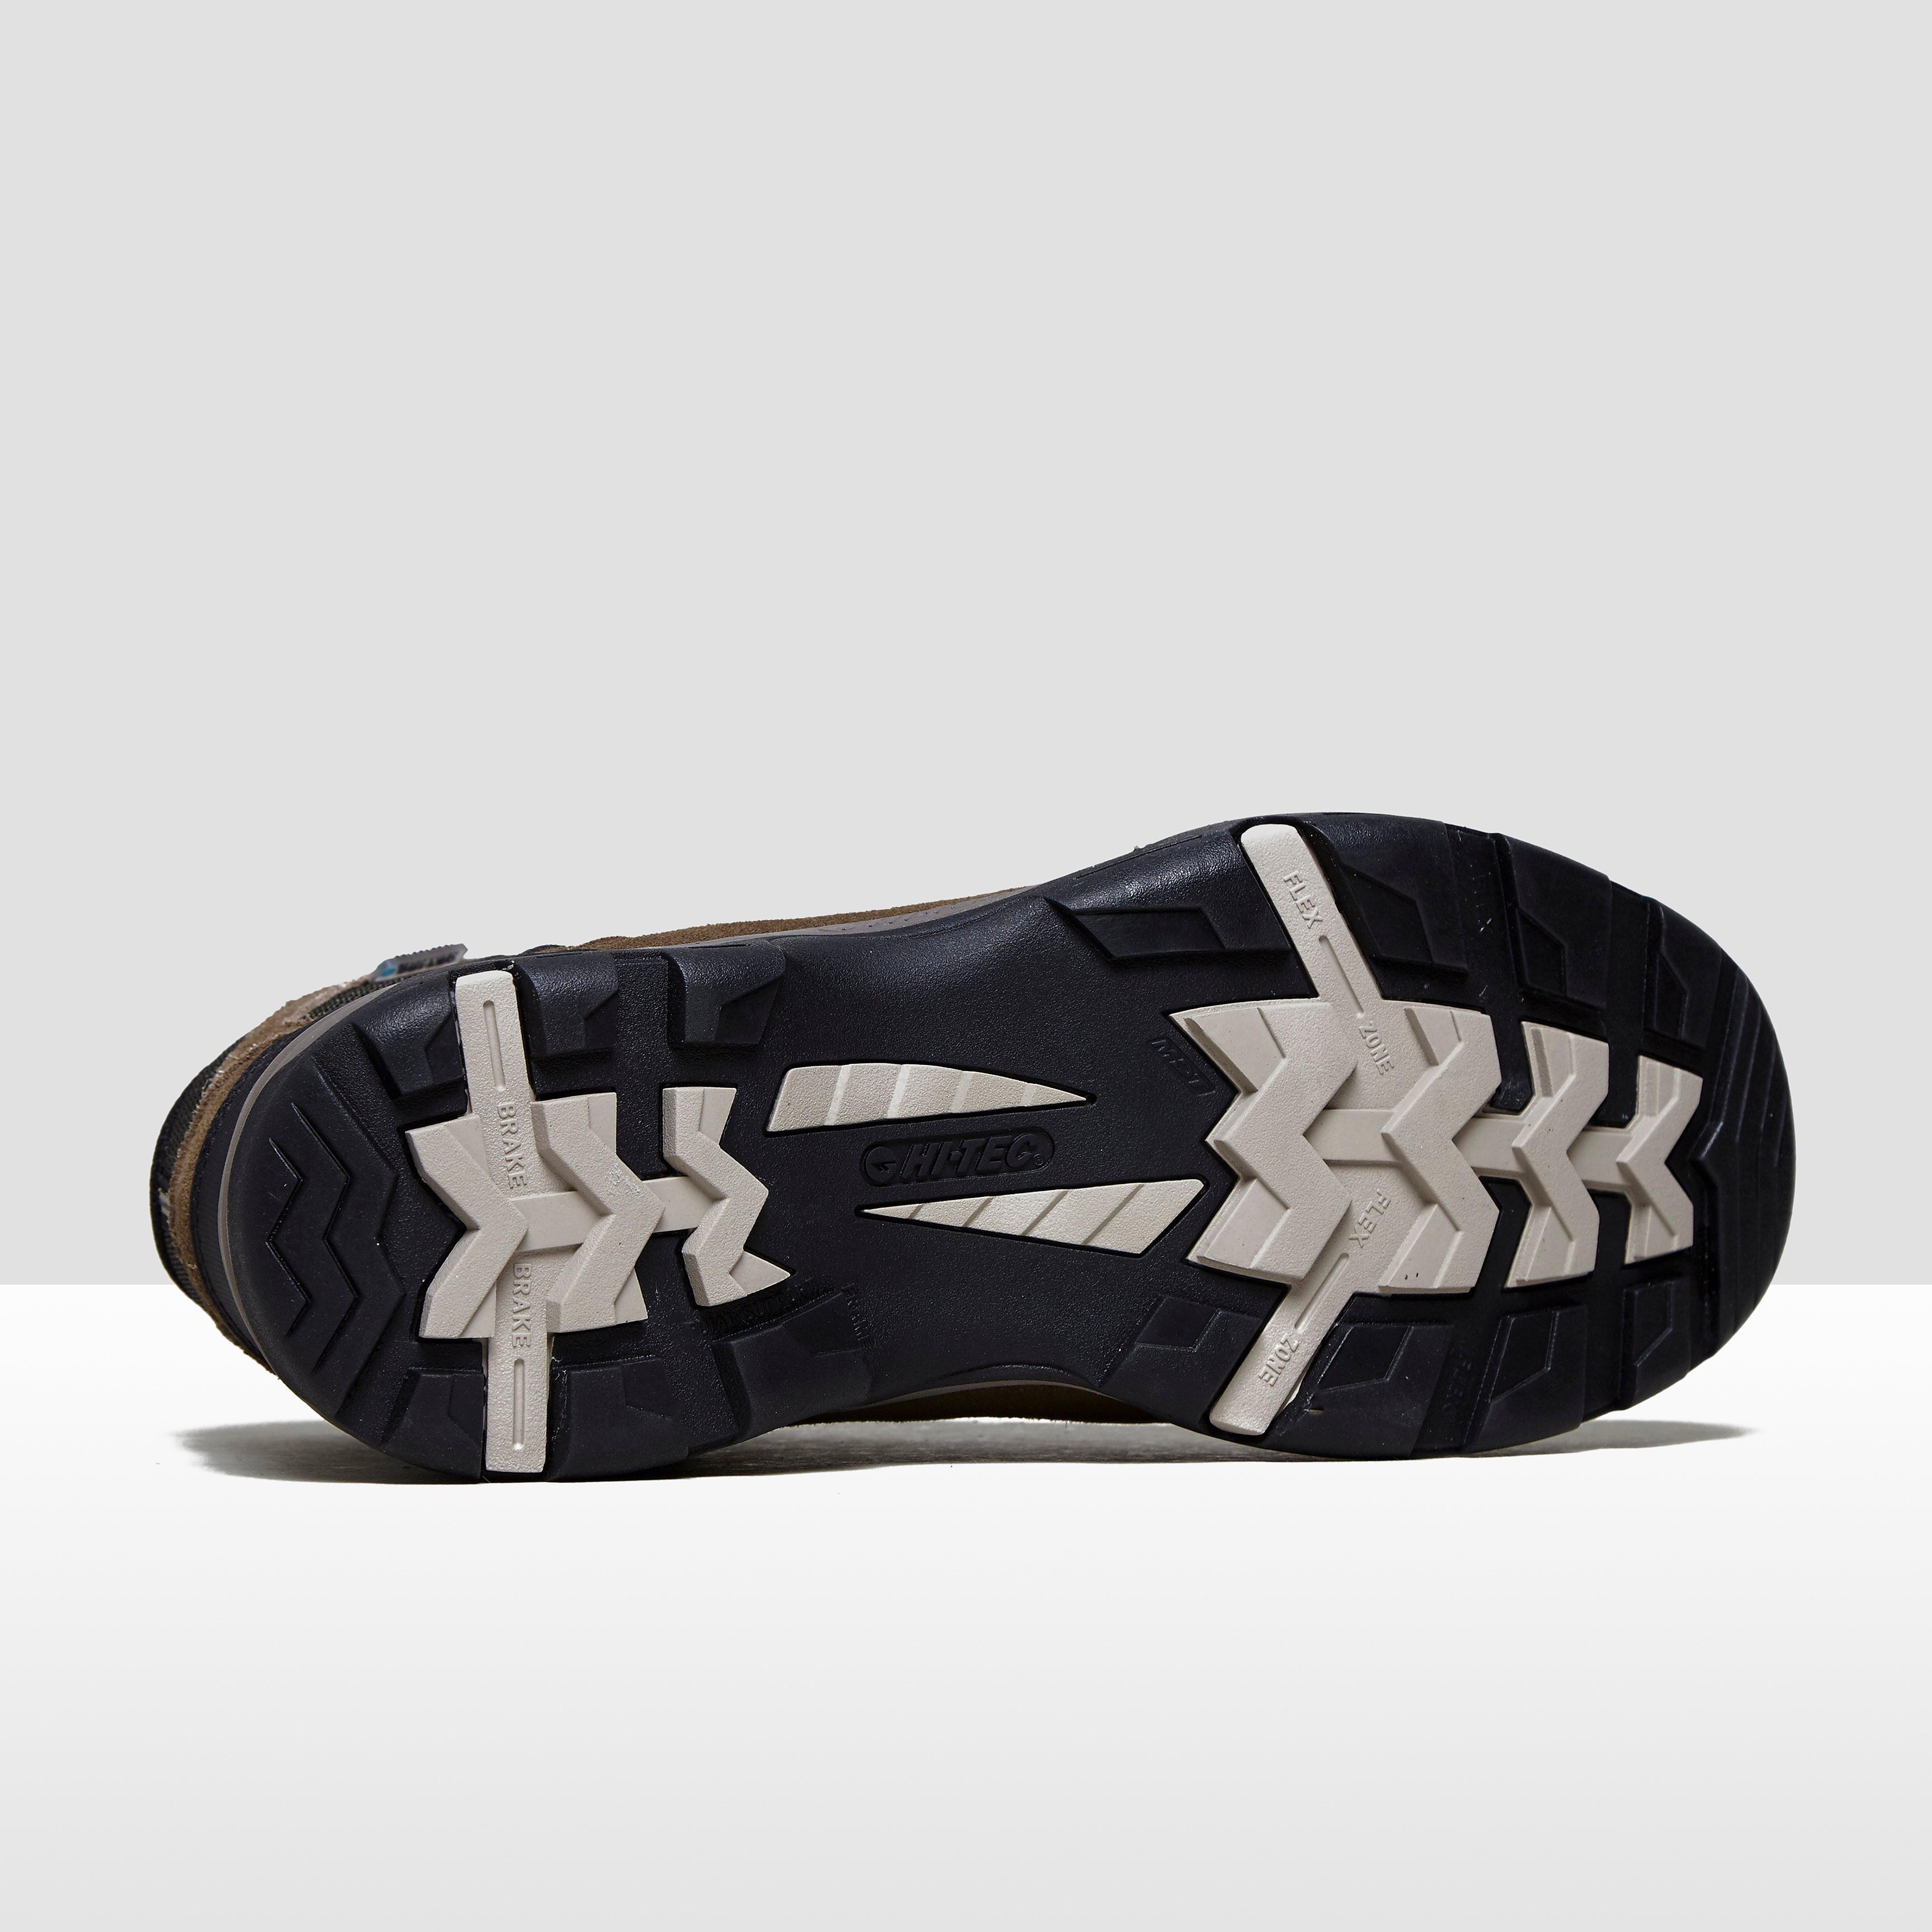 Hi Tec Bandera II Waterproof Mid Men's Walking Boots